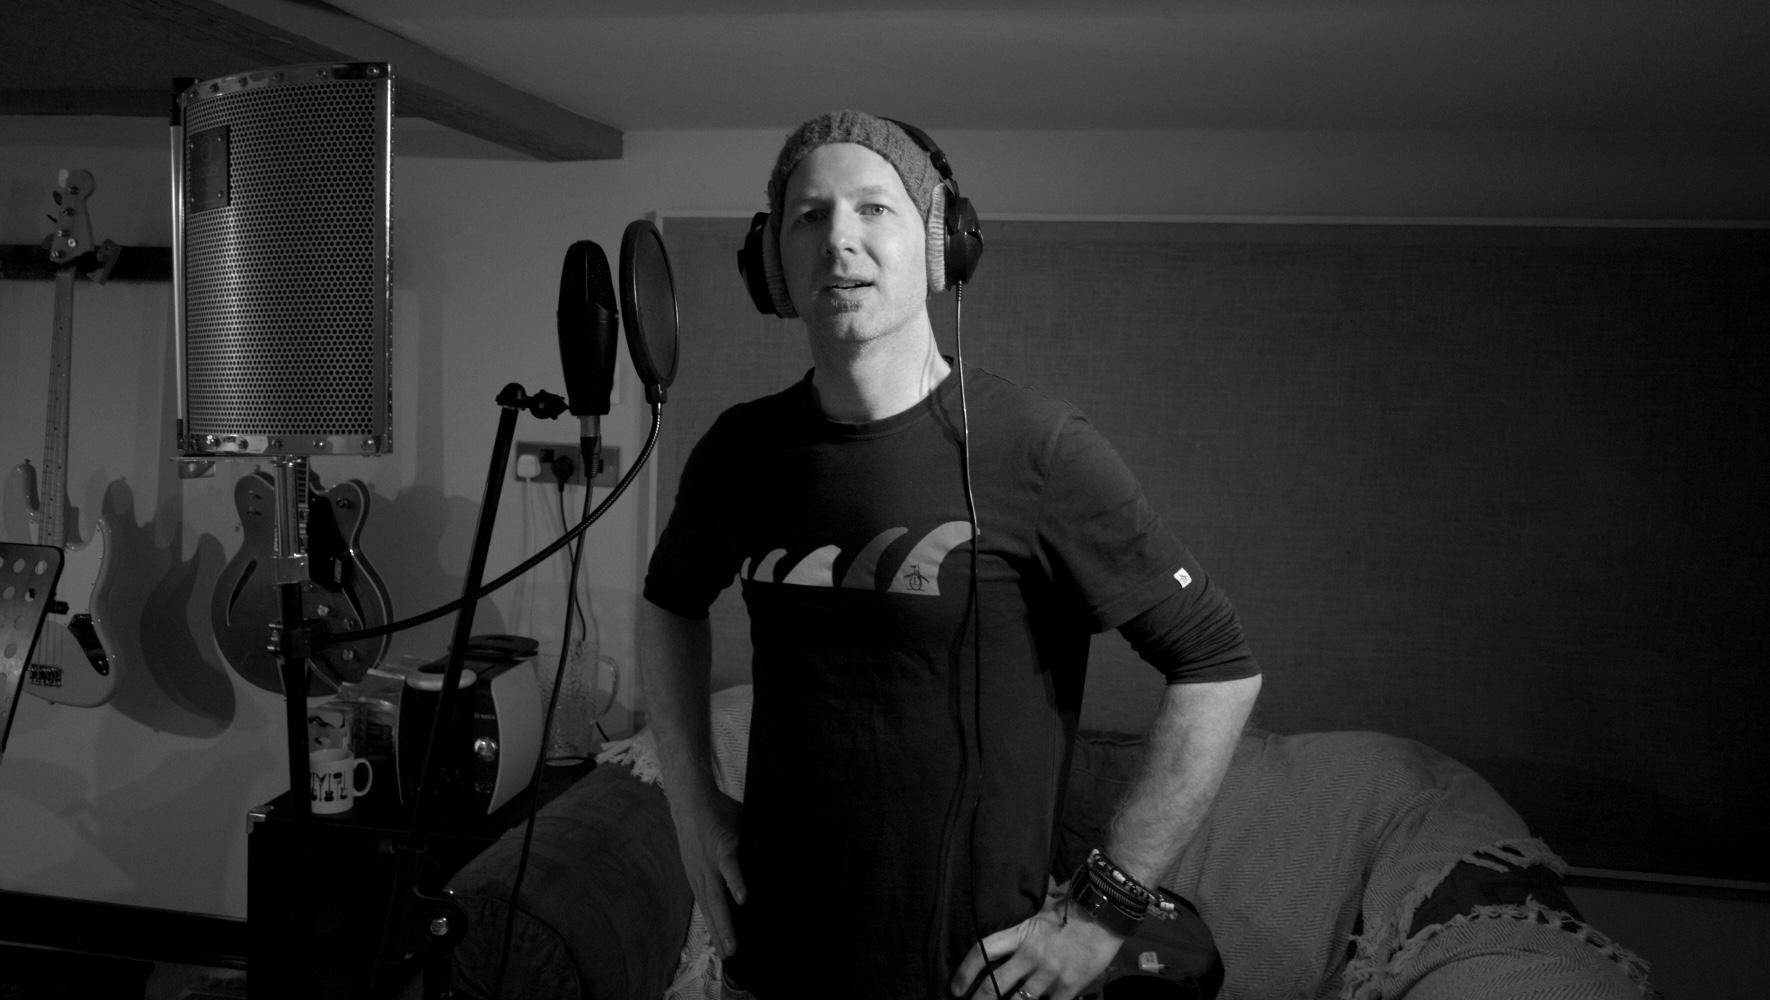 Matt recording vocals during the final studio session.